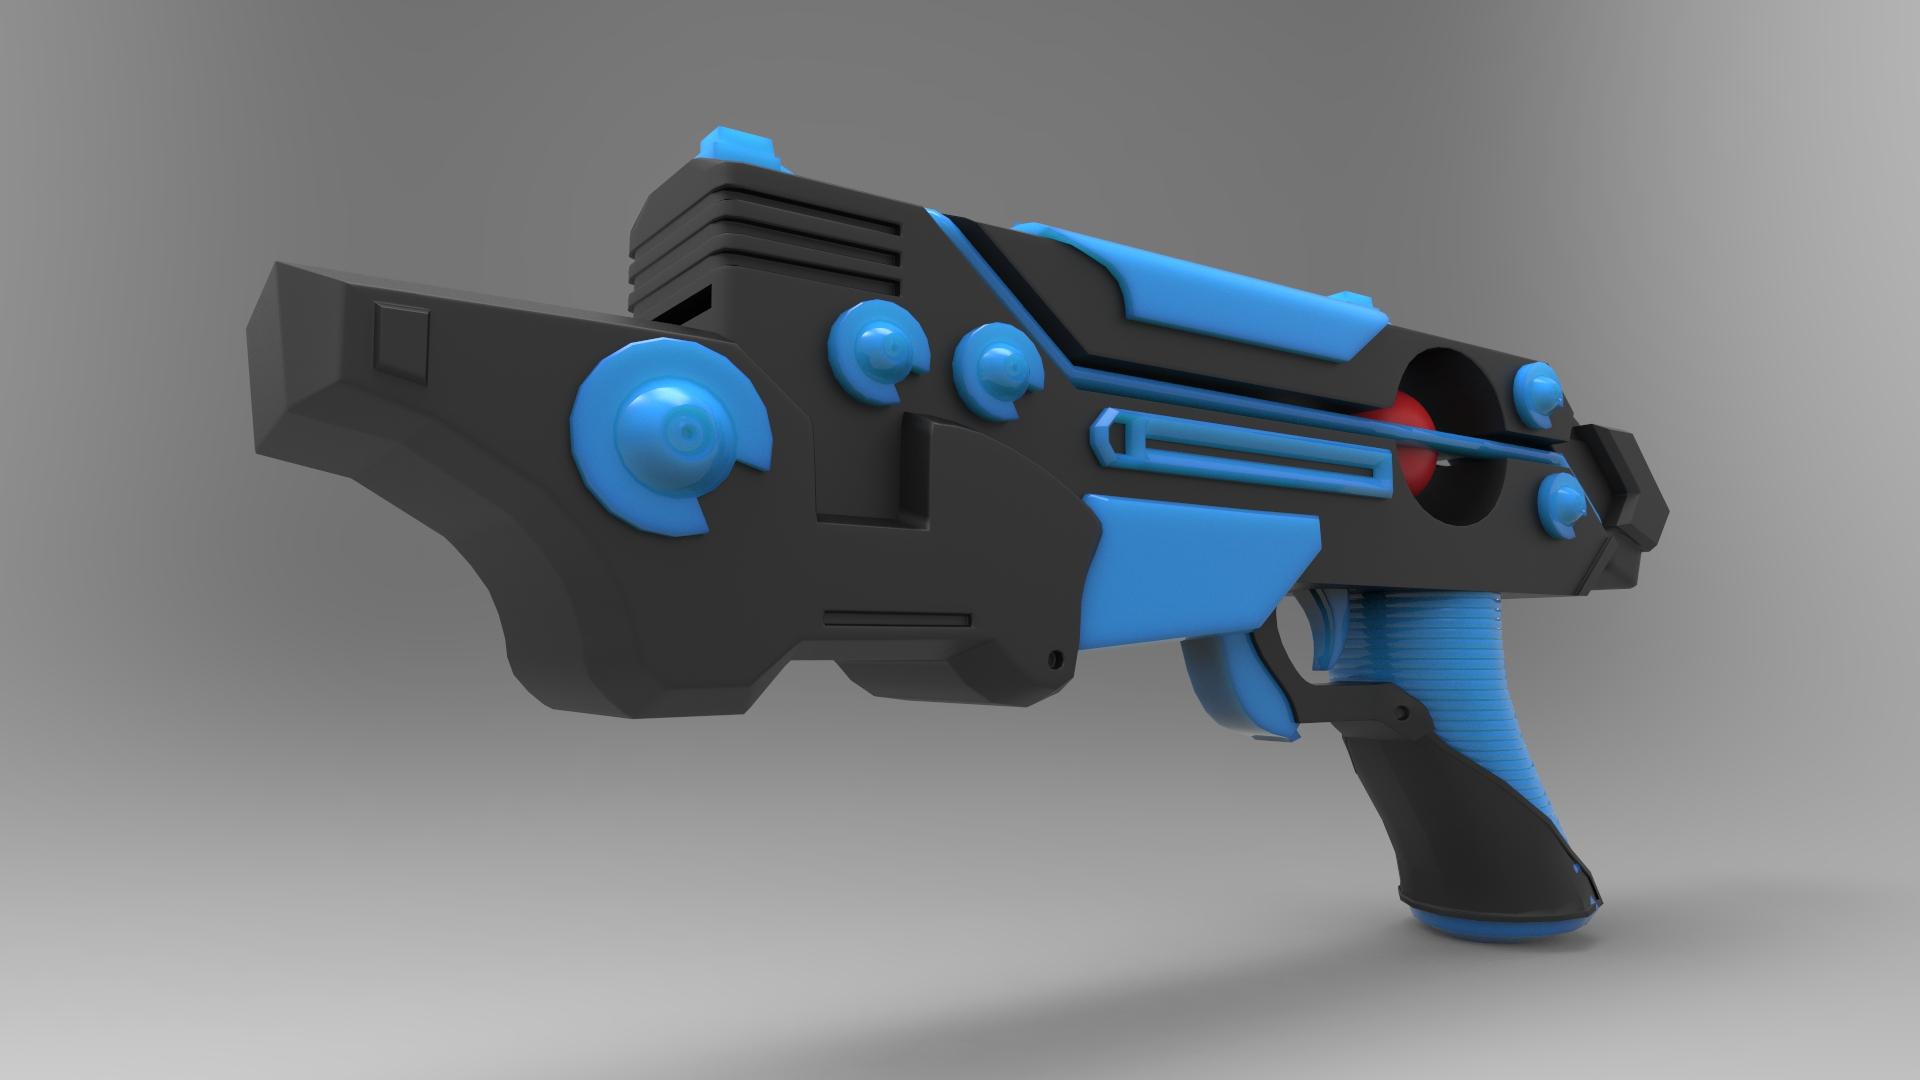 Toy Plasma Pistol Concept